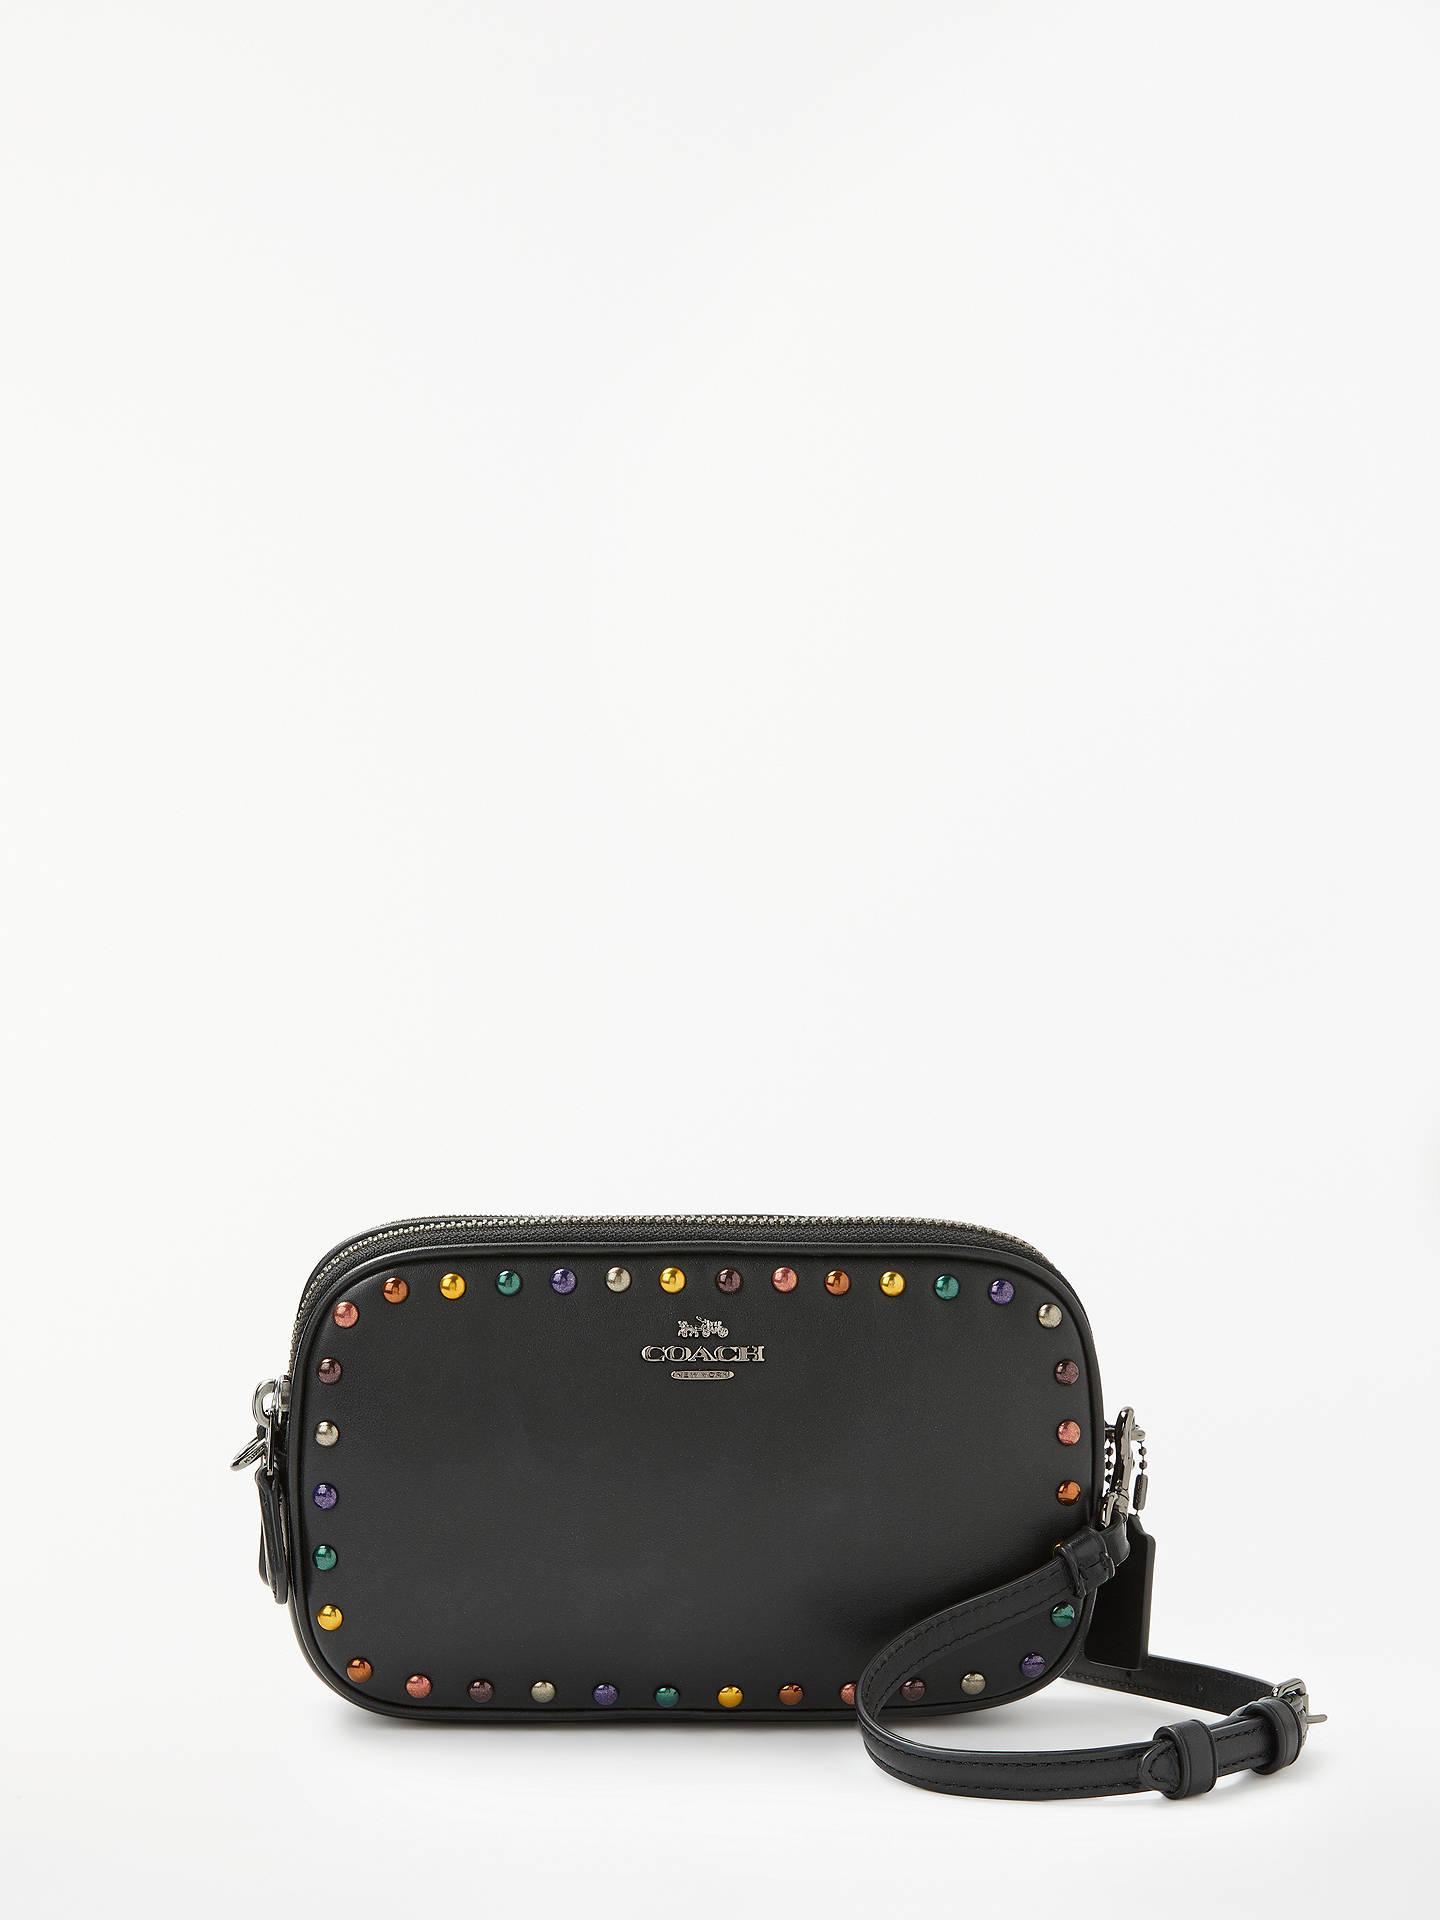 f2a9a6425 Buy Coach Rainbow Rivets Cross Body Bag, Black Online at johnlewis.com ...